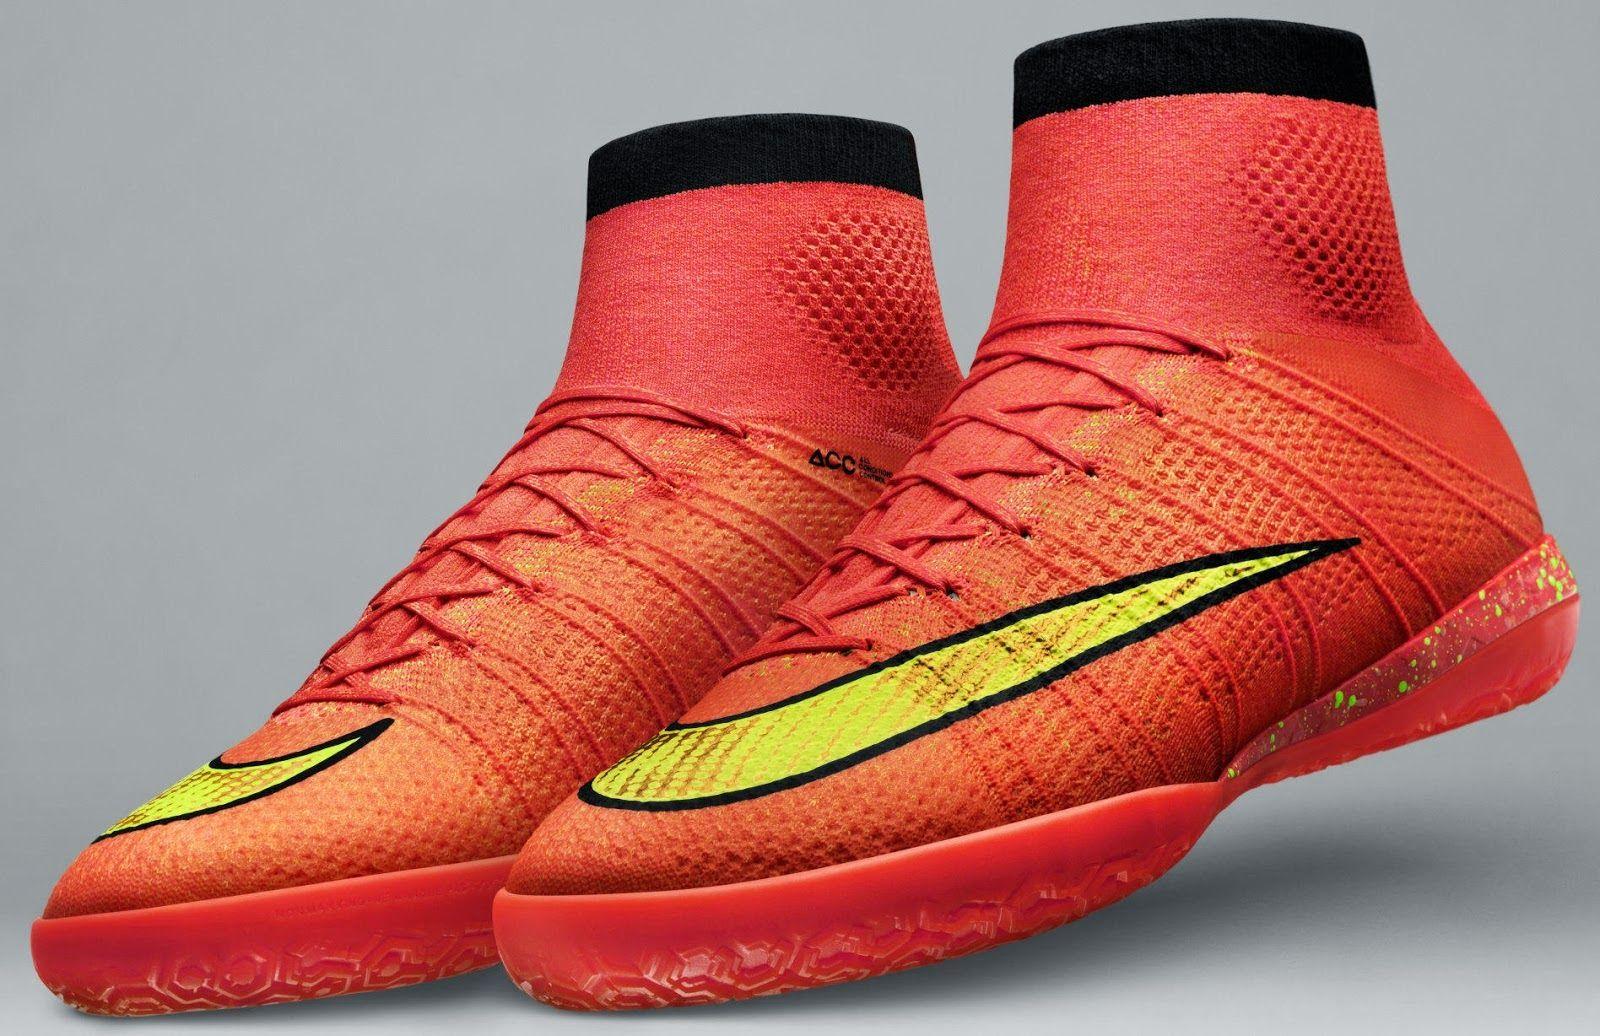 ¡Nuevos botines Nike Elastico Superfly Flyknit!